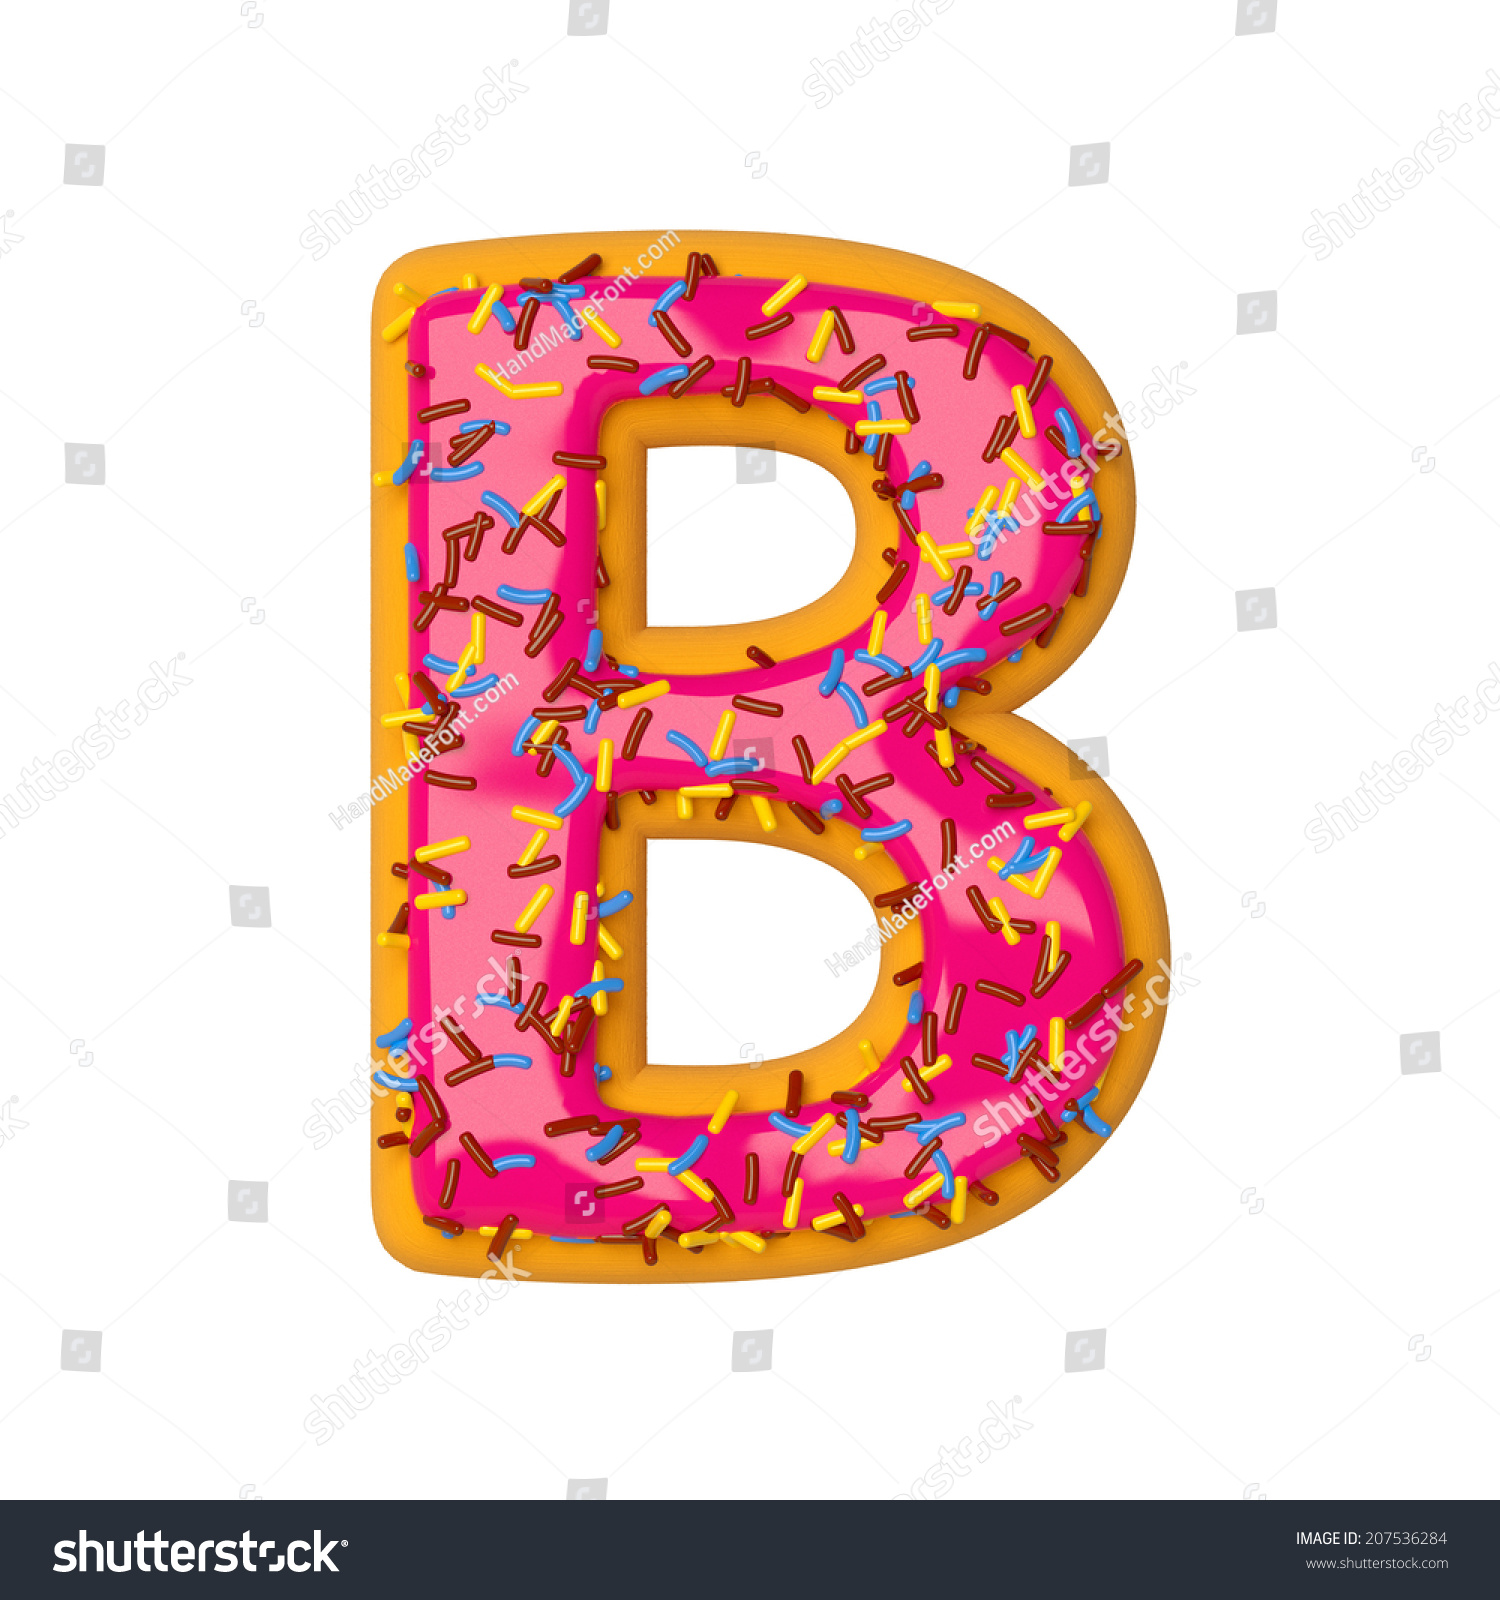 Creamy Biscuit Donut Alphabet Stock Photo